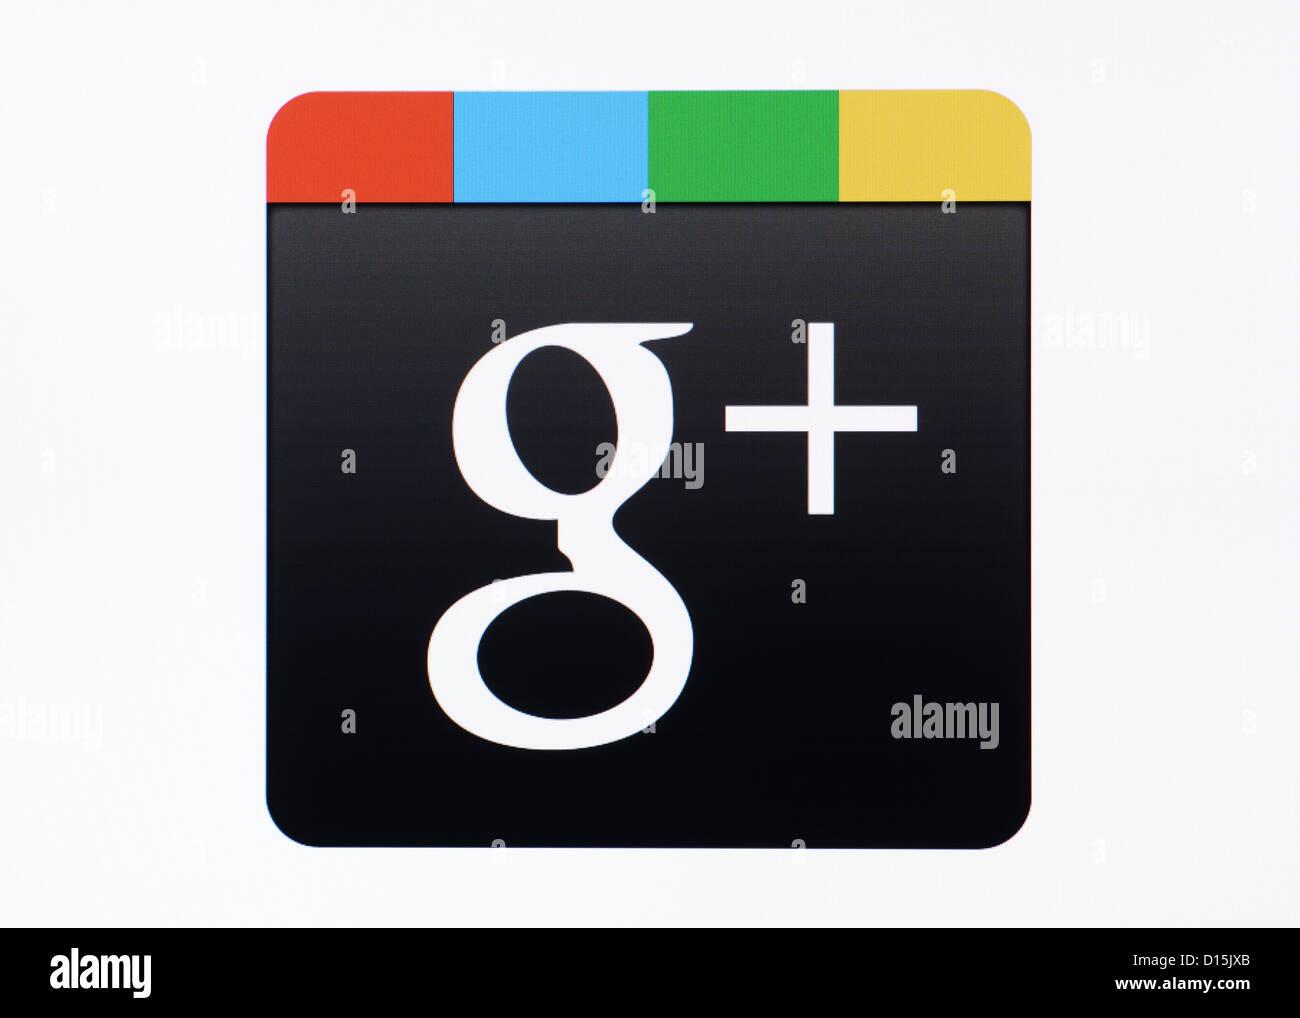 Google+ Logo Screenshot - Stock Image